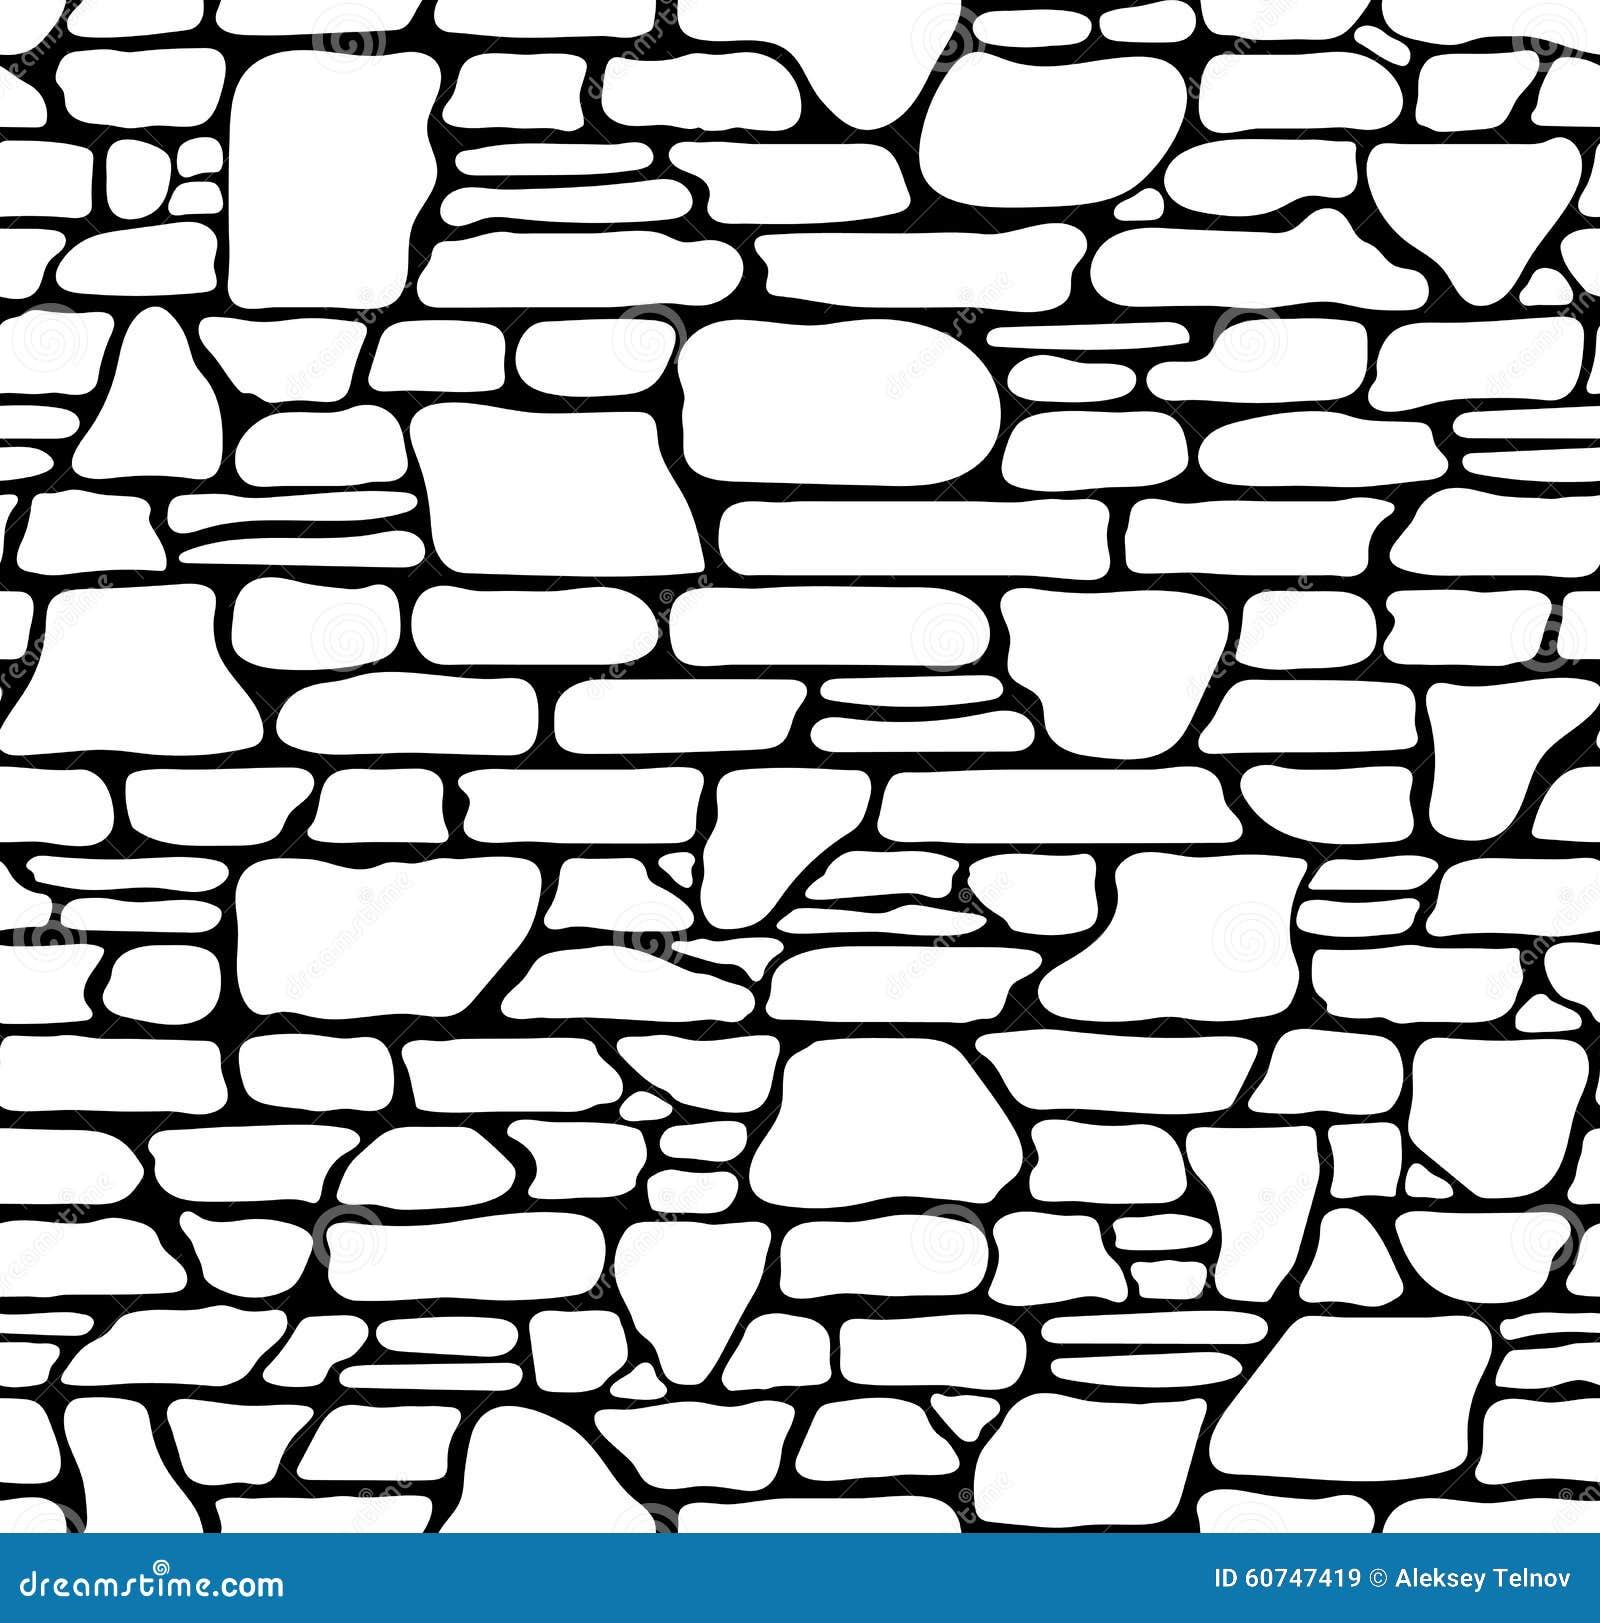 Stone Block Clip Art : Seamless stone texture stock vector image of illustration